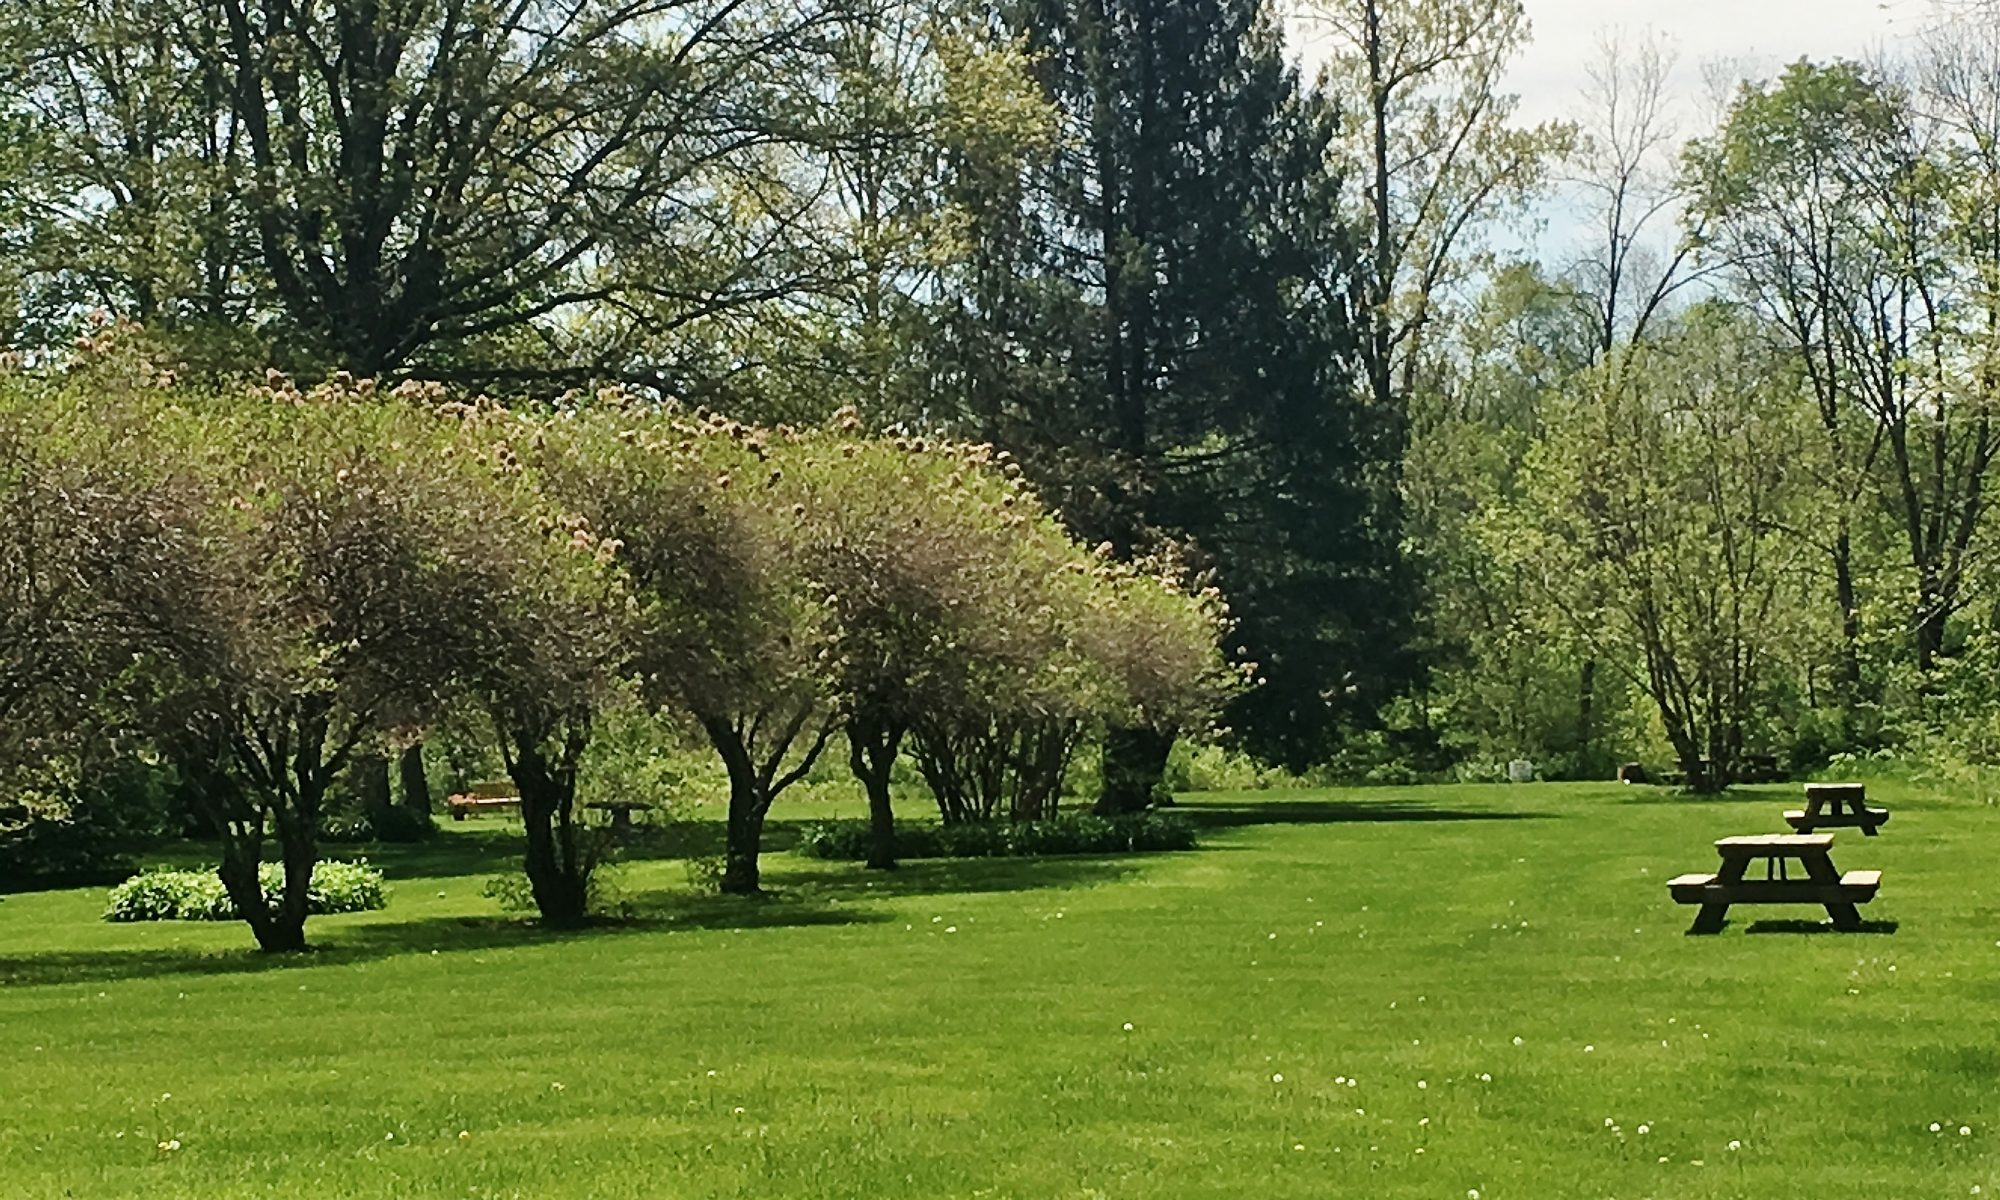 The Georgi Park Lawn